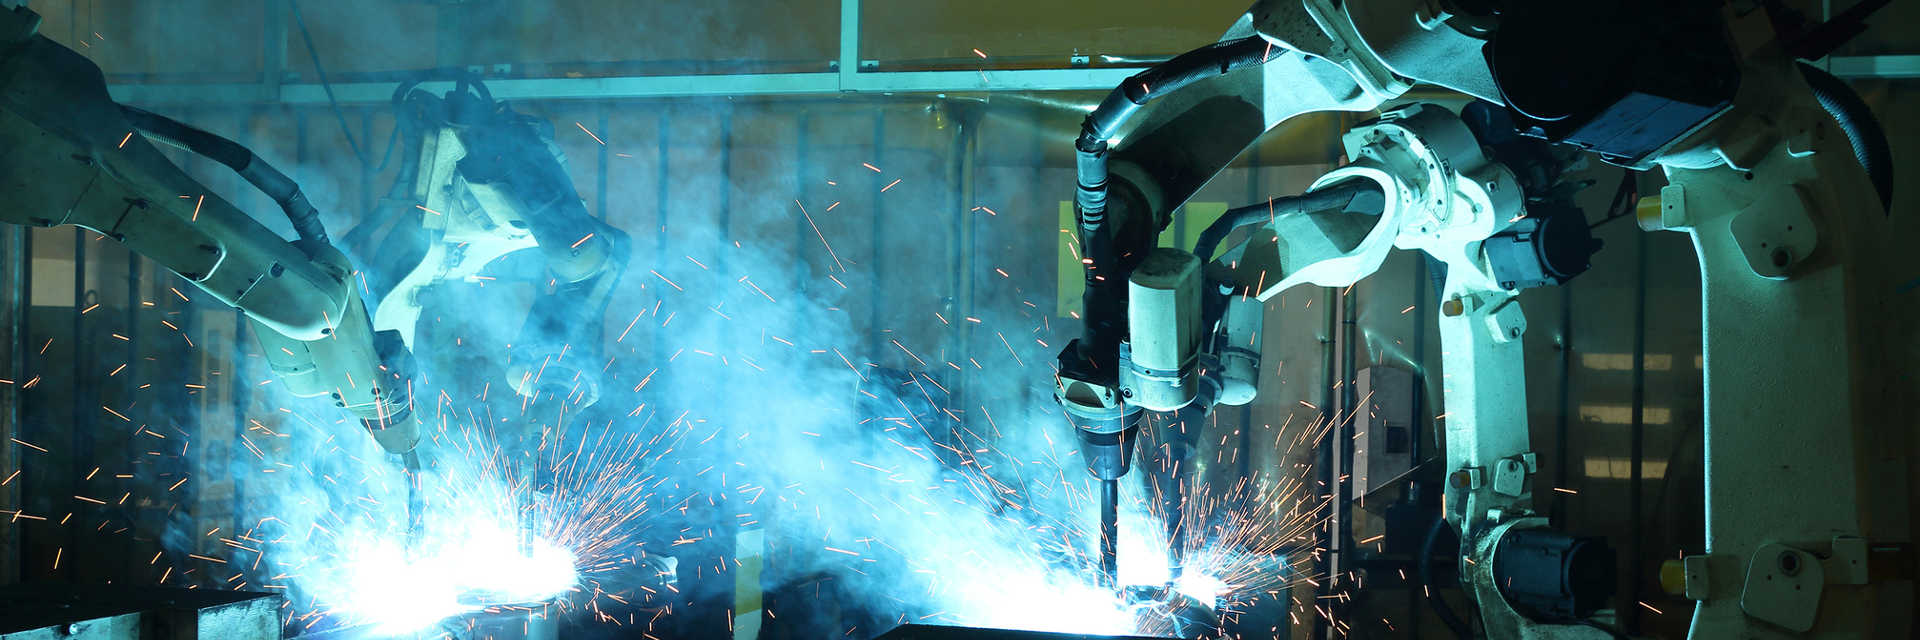 saldatura automatizzata mediante robot